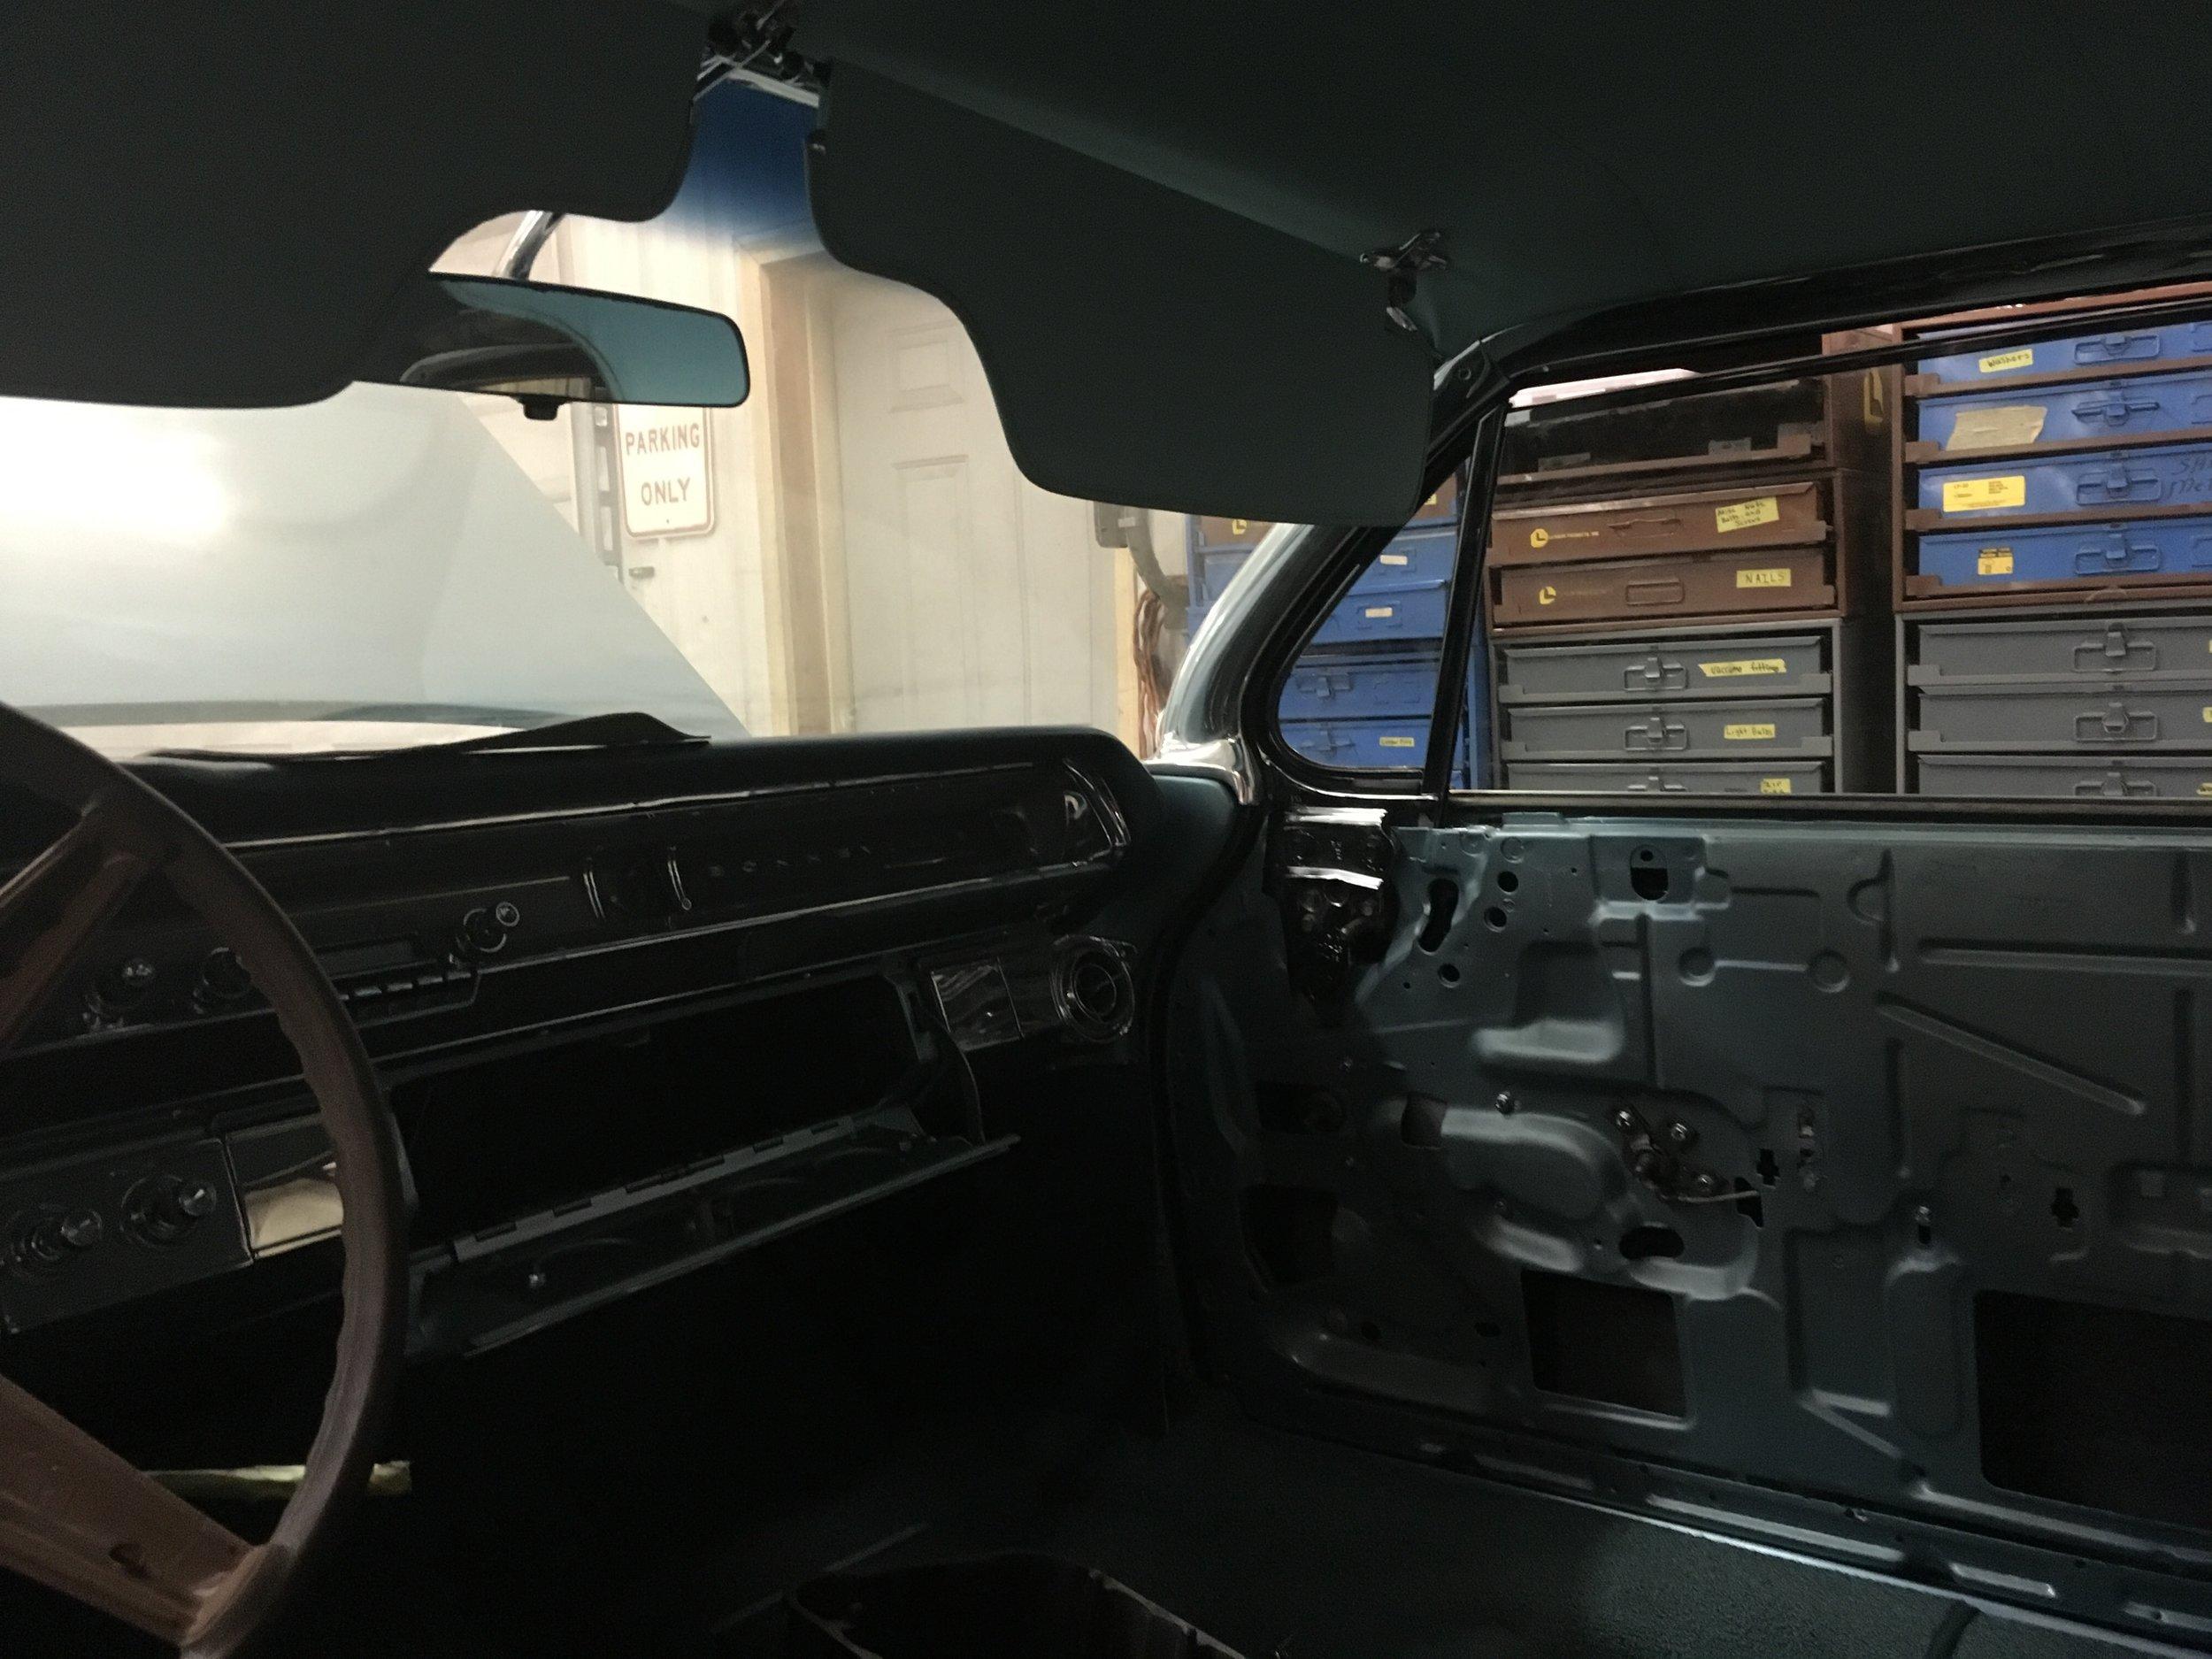 1962-Pontiac-Bonneville-minneapolis-hot-rod-custom-build-restoration-windshield.jpg